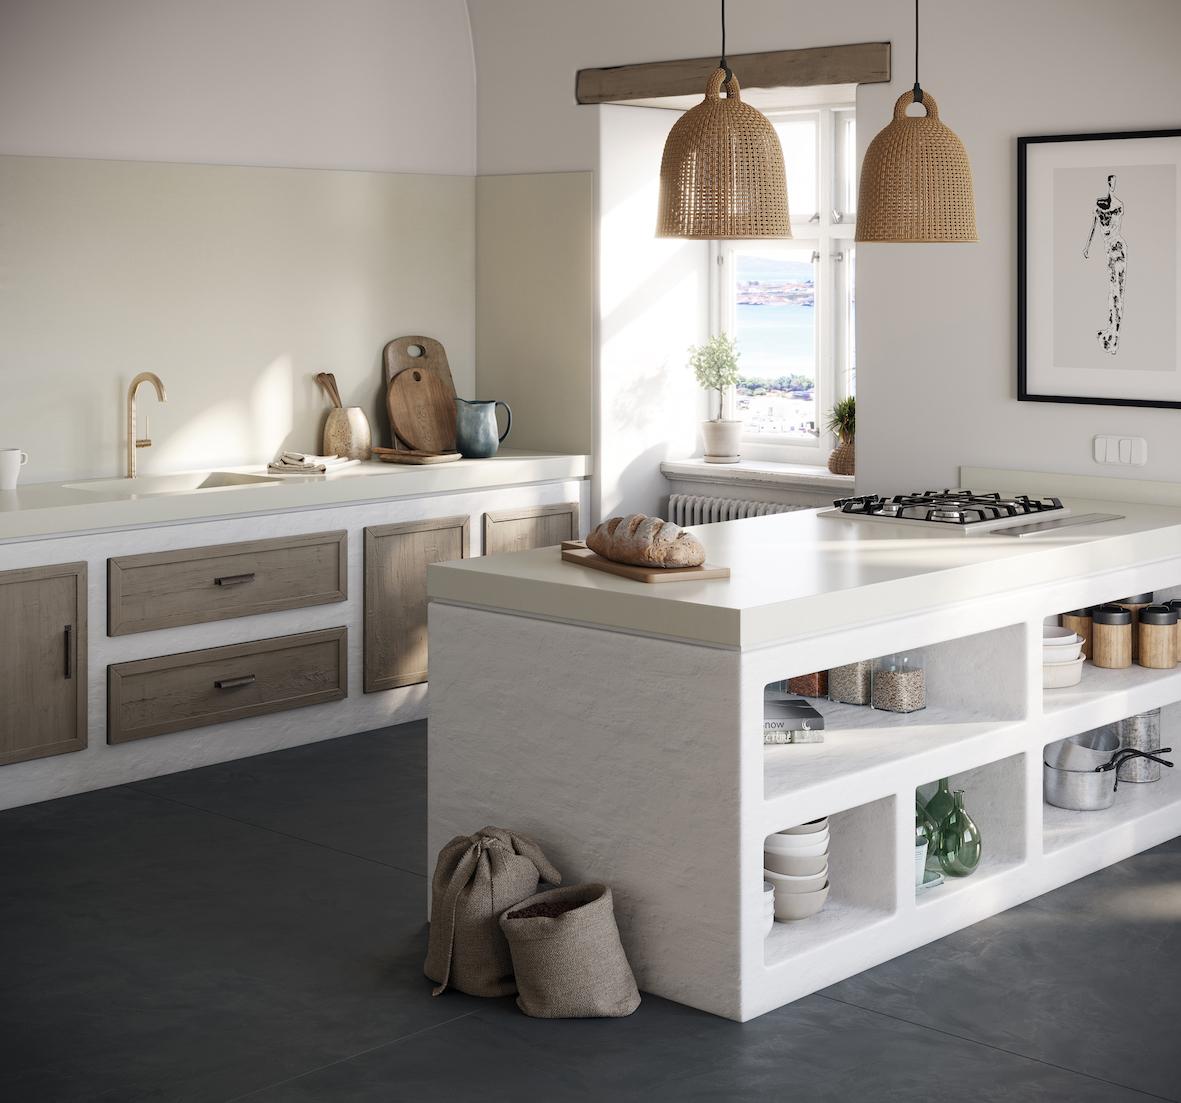 Image of 3. Silestone Sunlit Days Faro White Kitchen Lifestyle in Sunlit Days Longlisted in Designer Awards 2021 - Cosentino